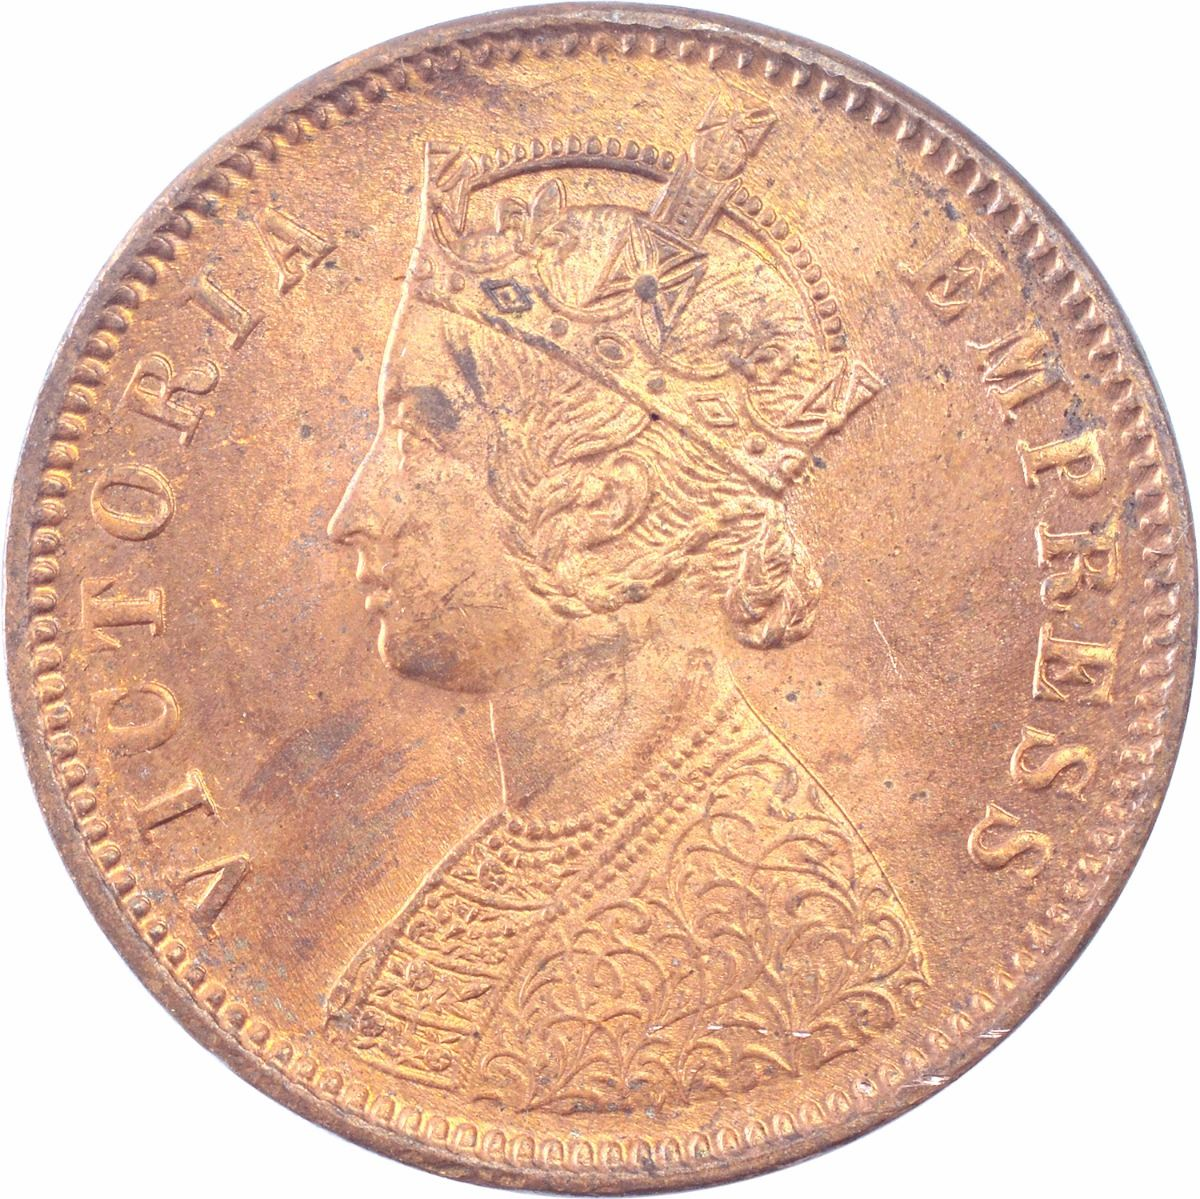 Copper Quarter Anna Coin of Victoria Empress of Calcutta Mint of 1880